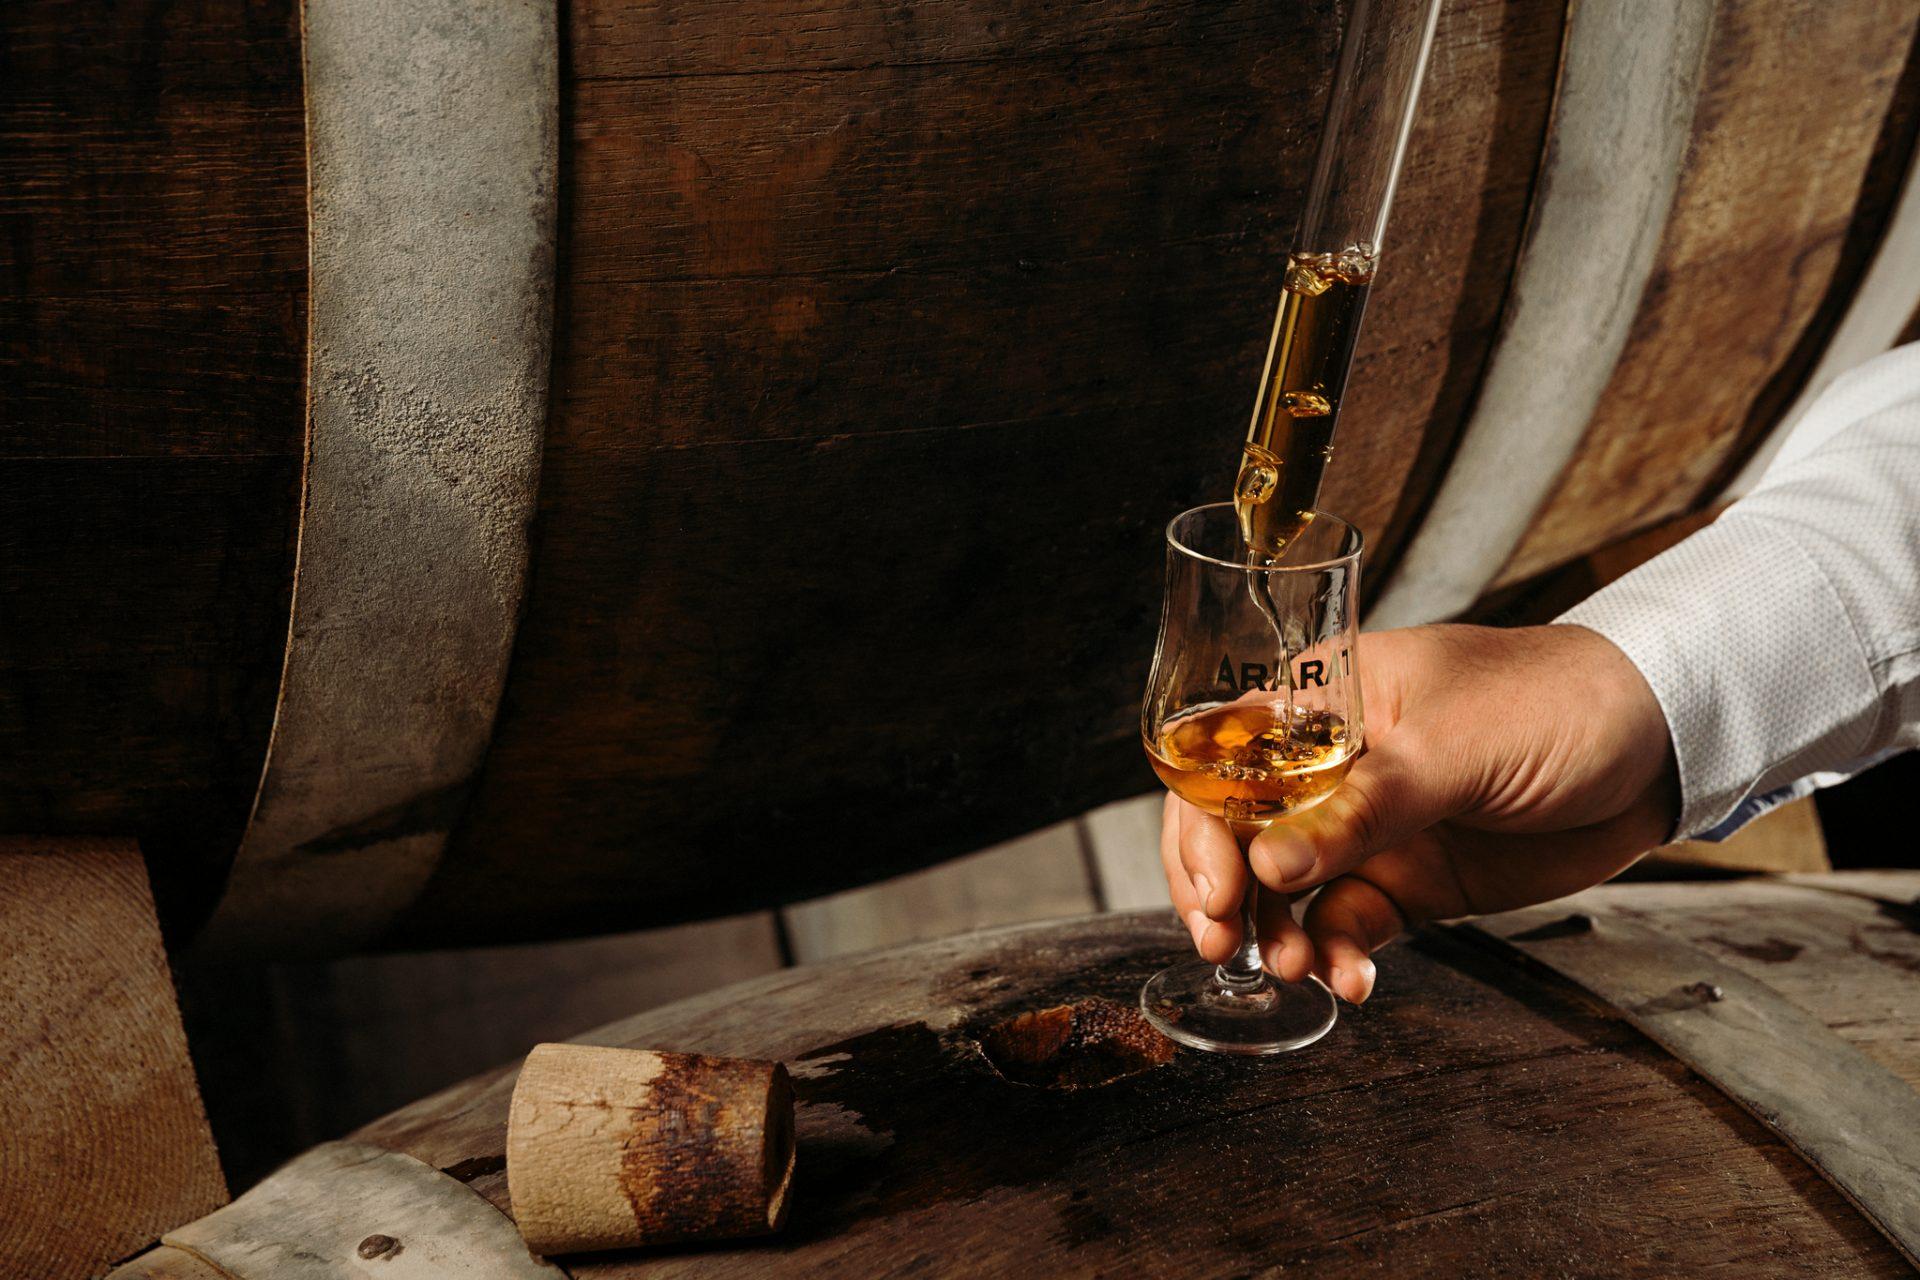 Ararat Cognac Arménien